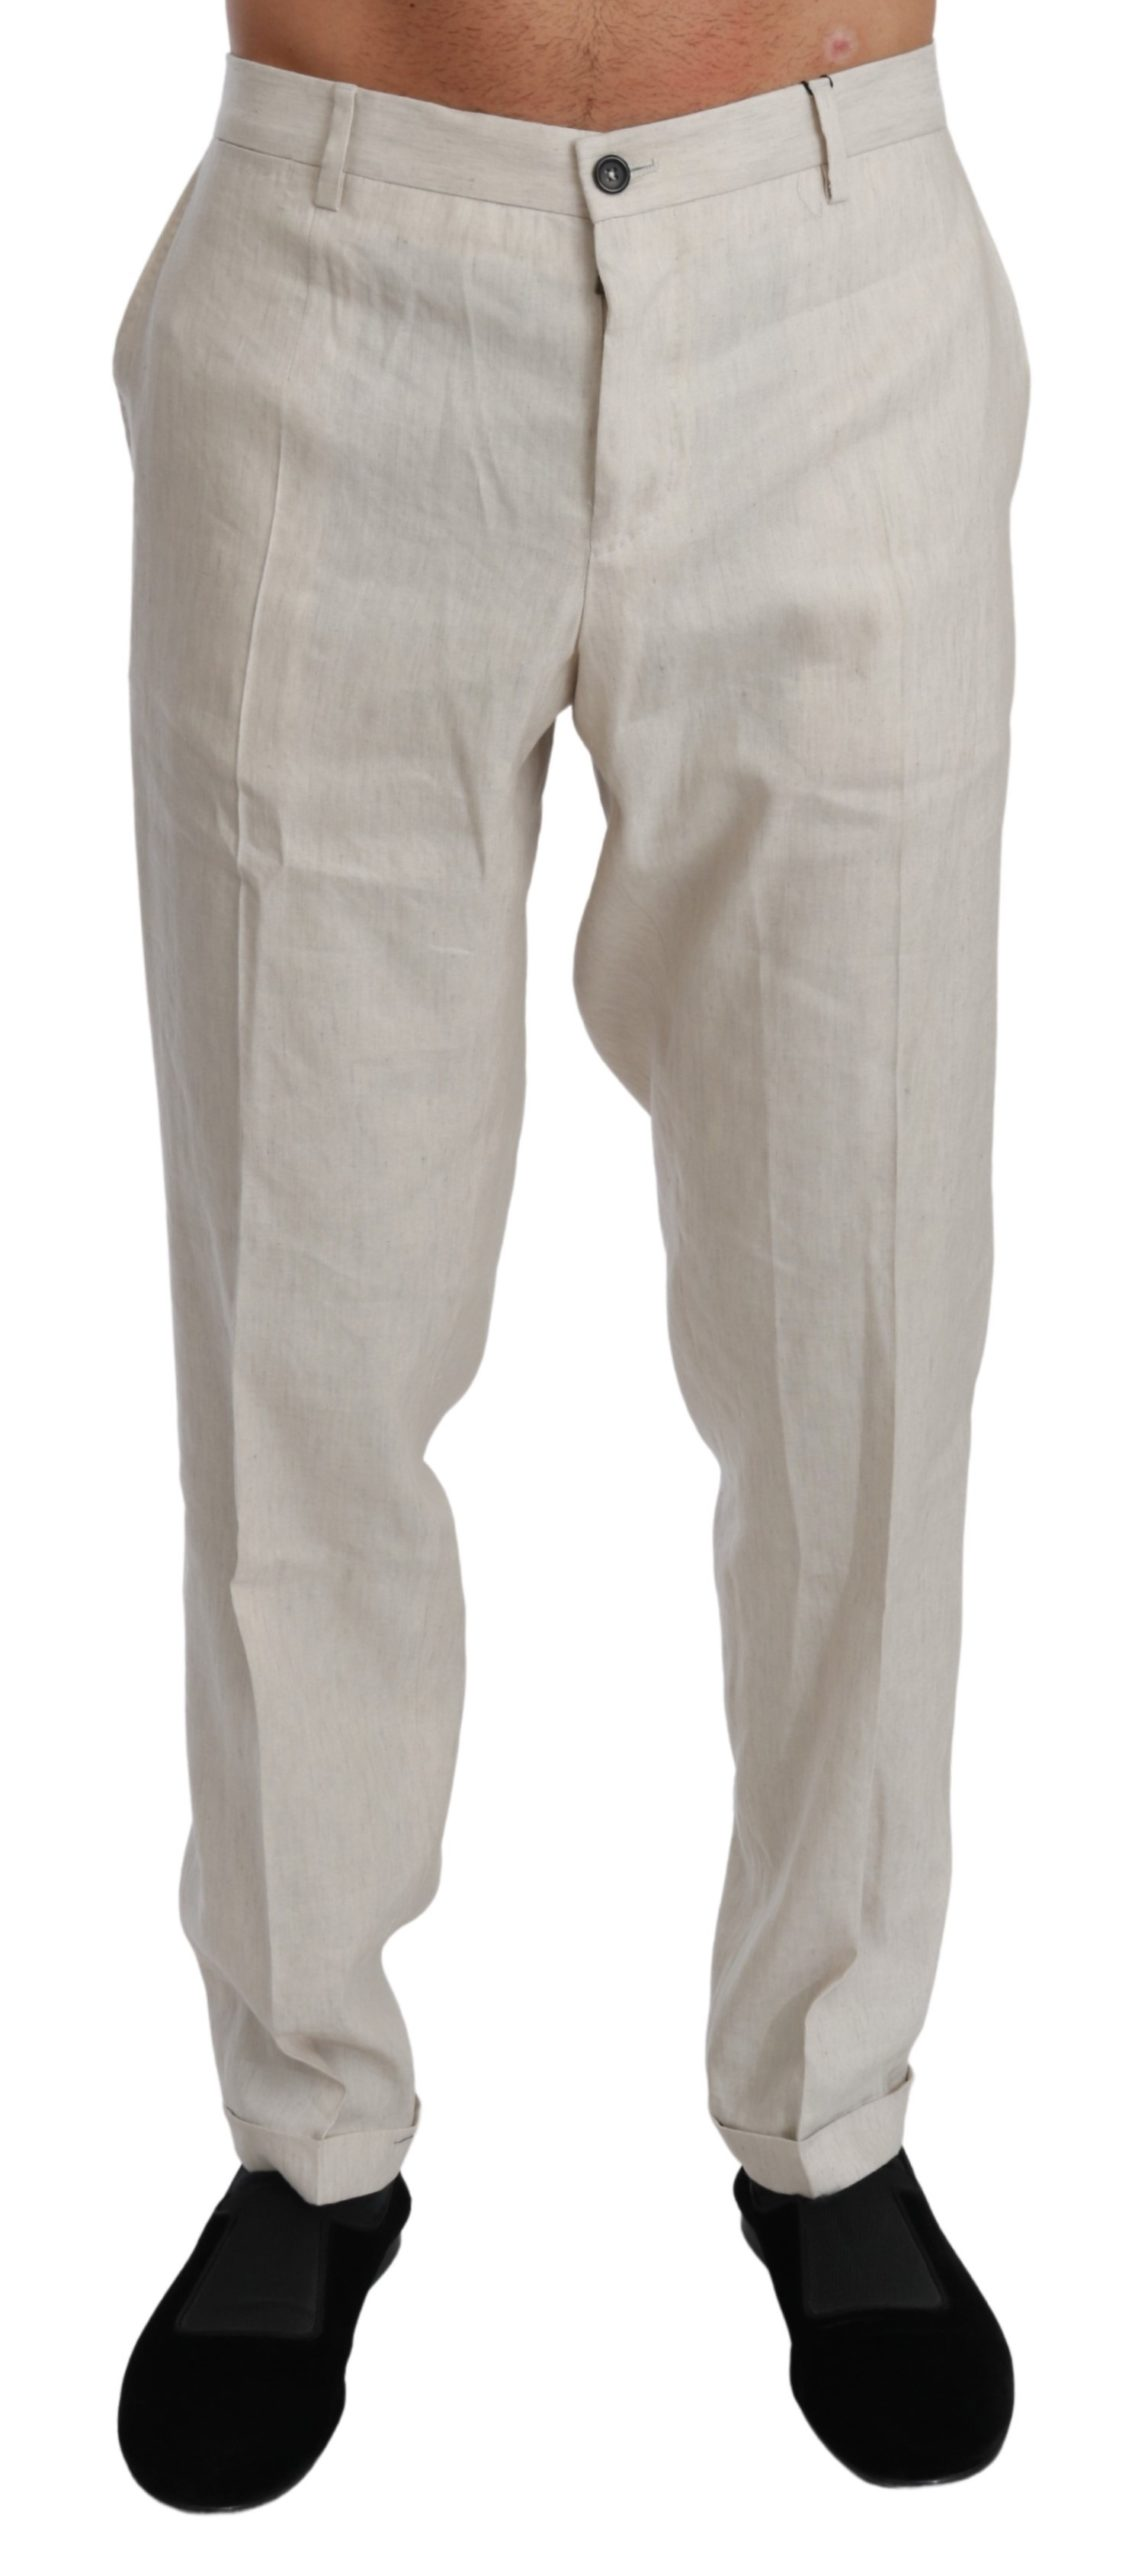 Dolce & Gabbana Men's Linen Casual Flax Trouser White PAN70993 - IT52   XL